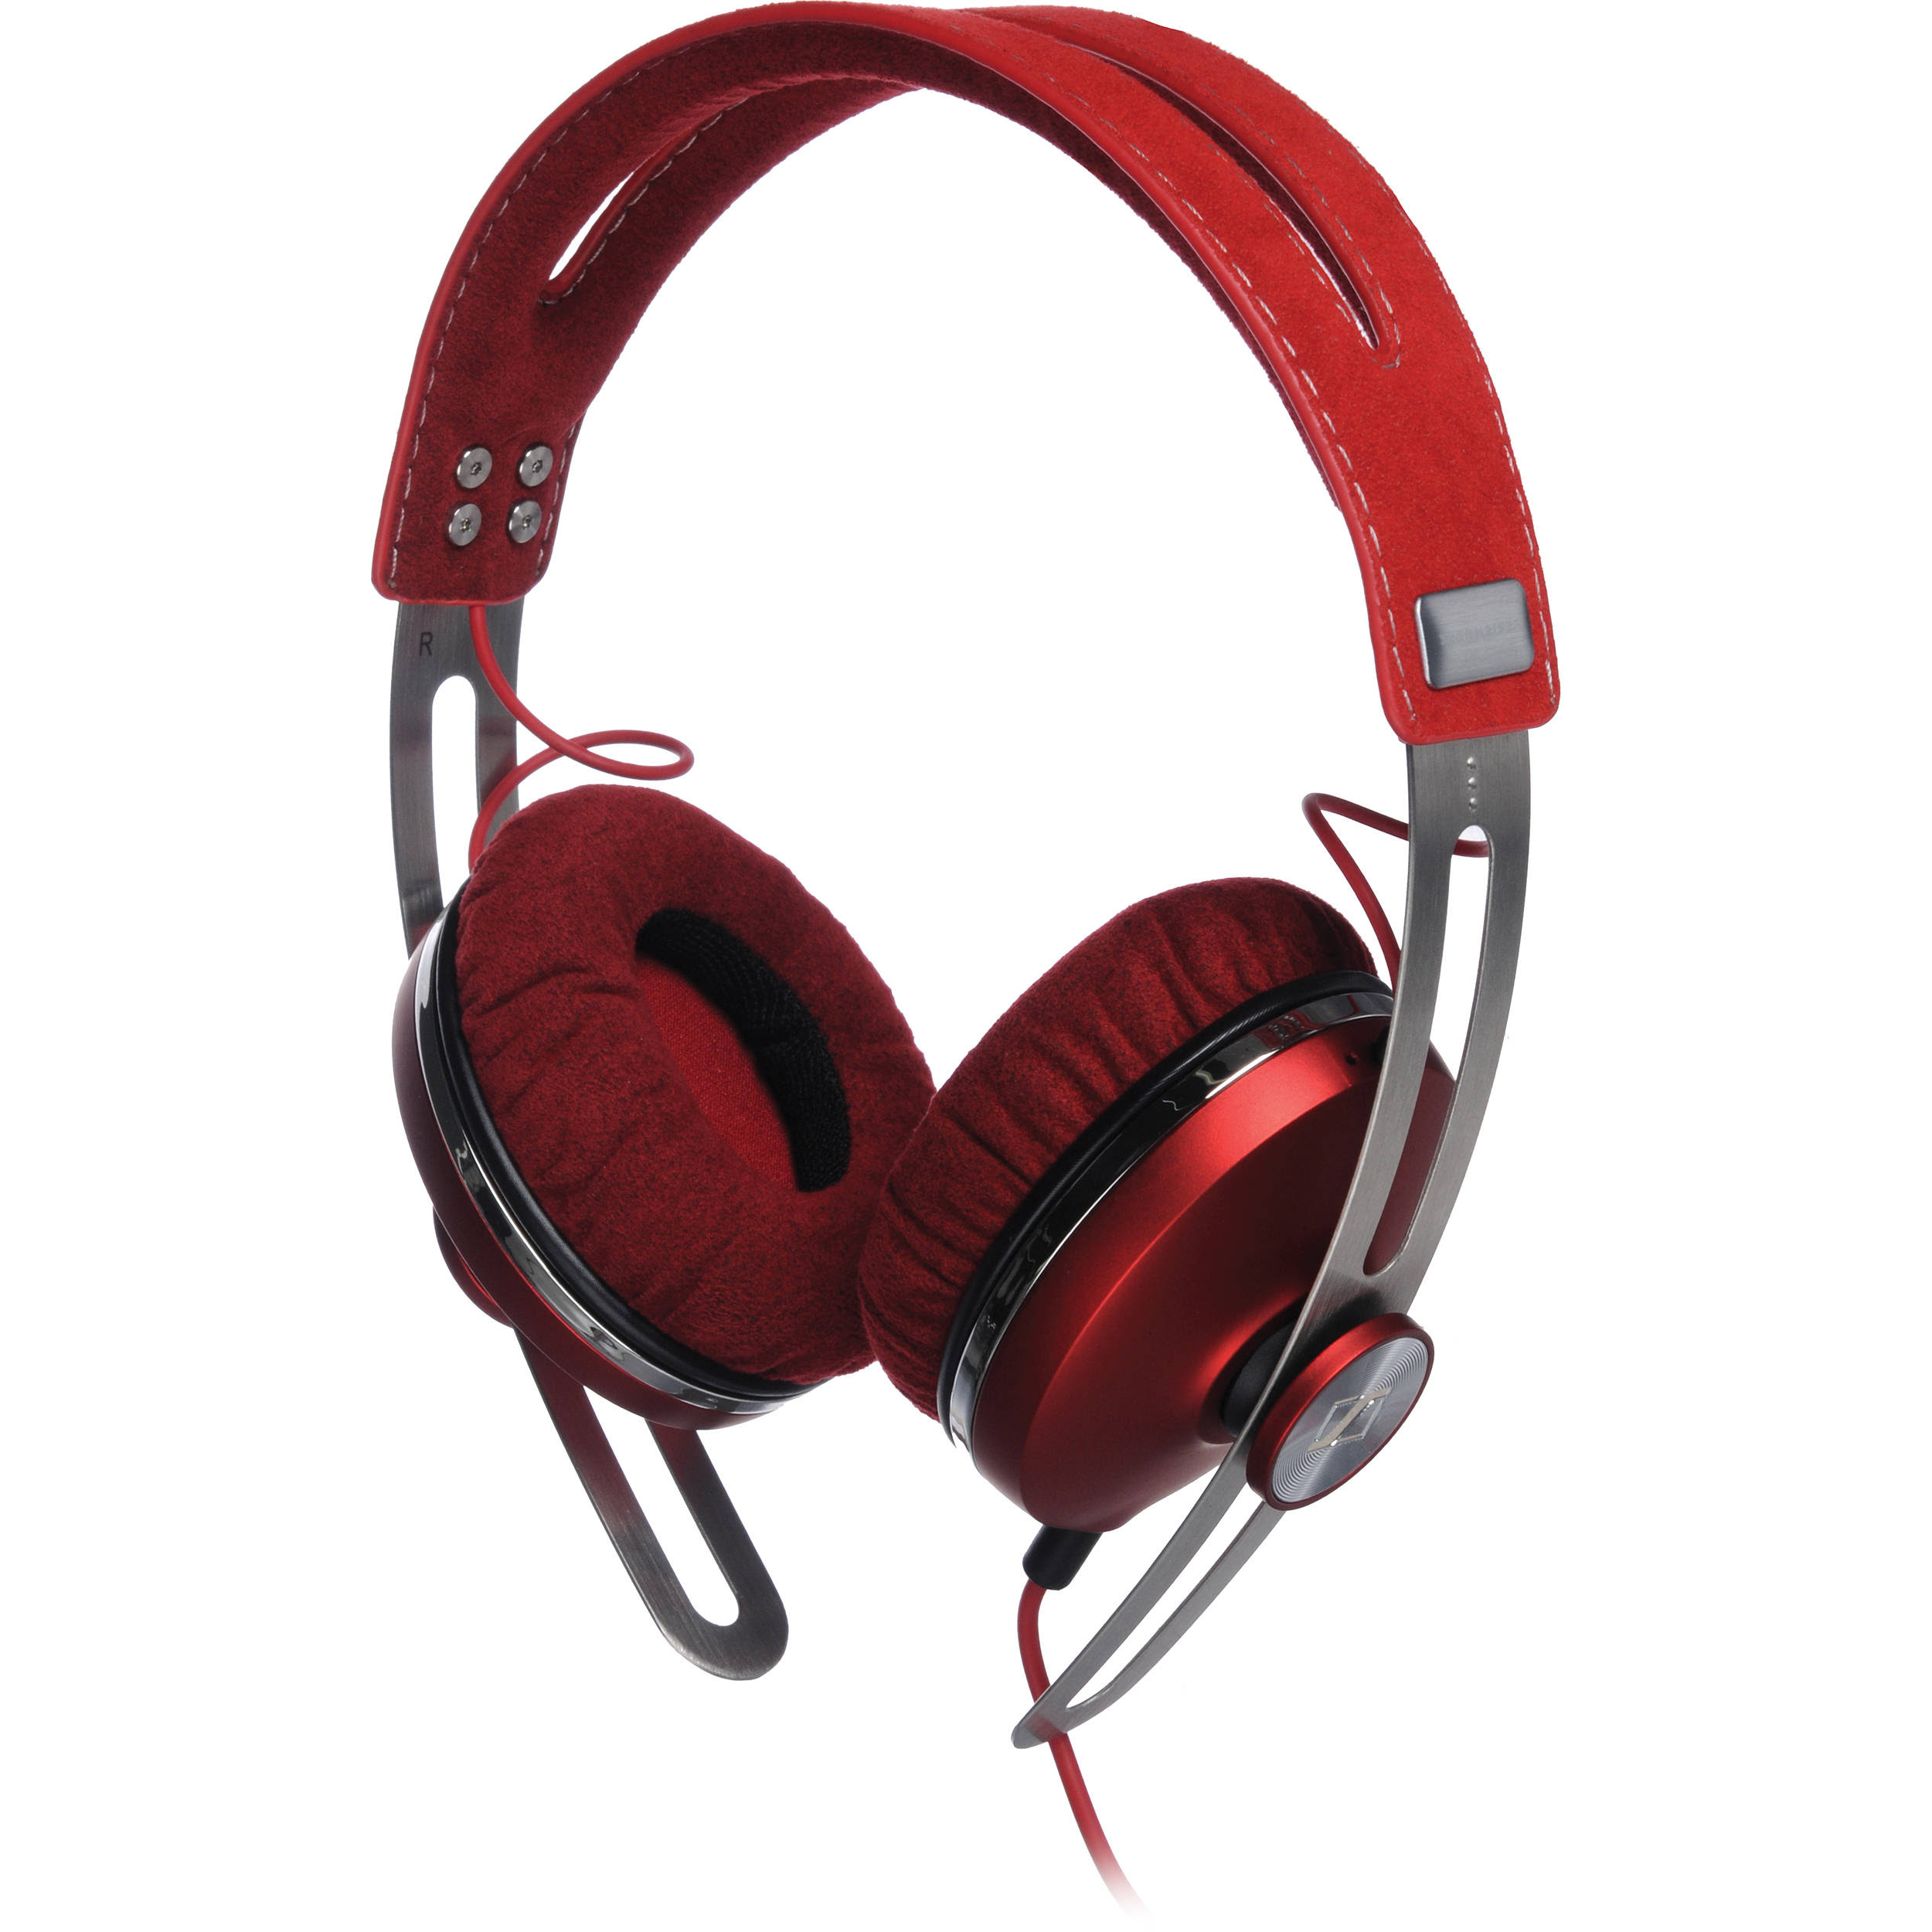 Sennheiser Momentum On-Ear Headphones (Red) 505993 B&H Photo